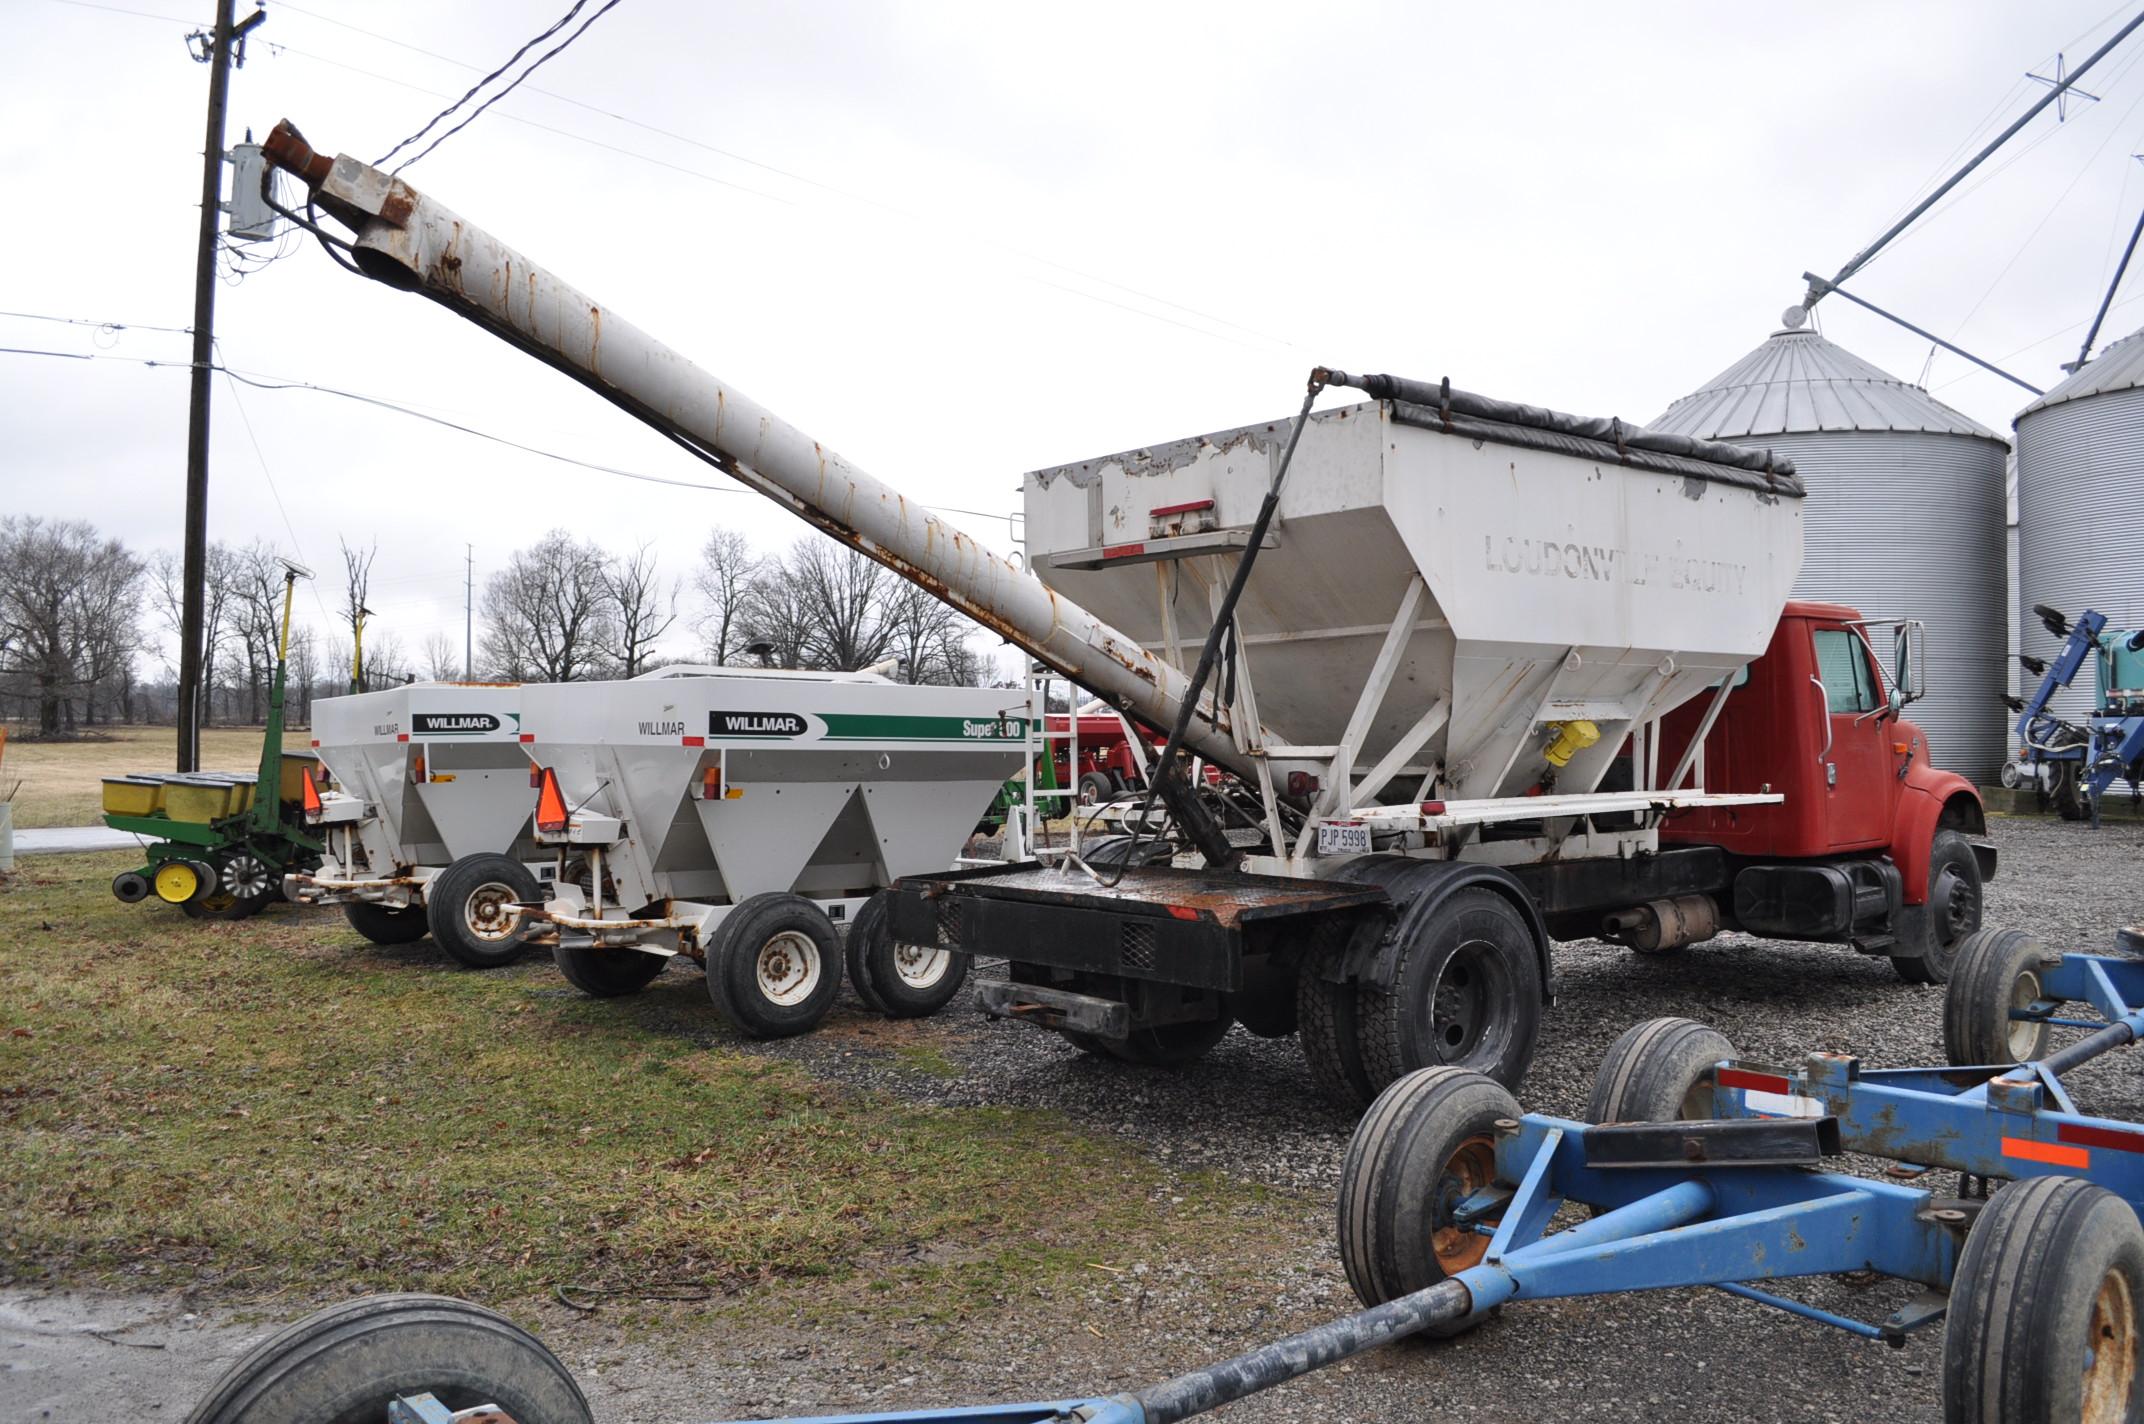 2000 International 4900 dry fertilizer tender truck, single axle, DT466E, Spicer 6 spd, spring ride, - Image 3 of 21